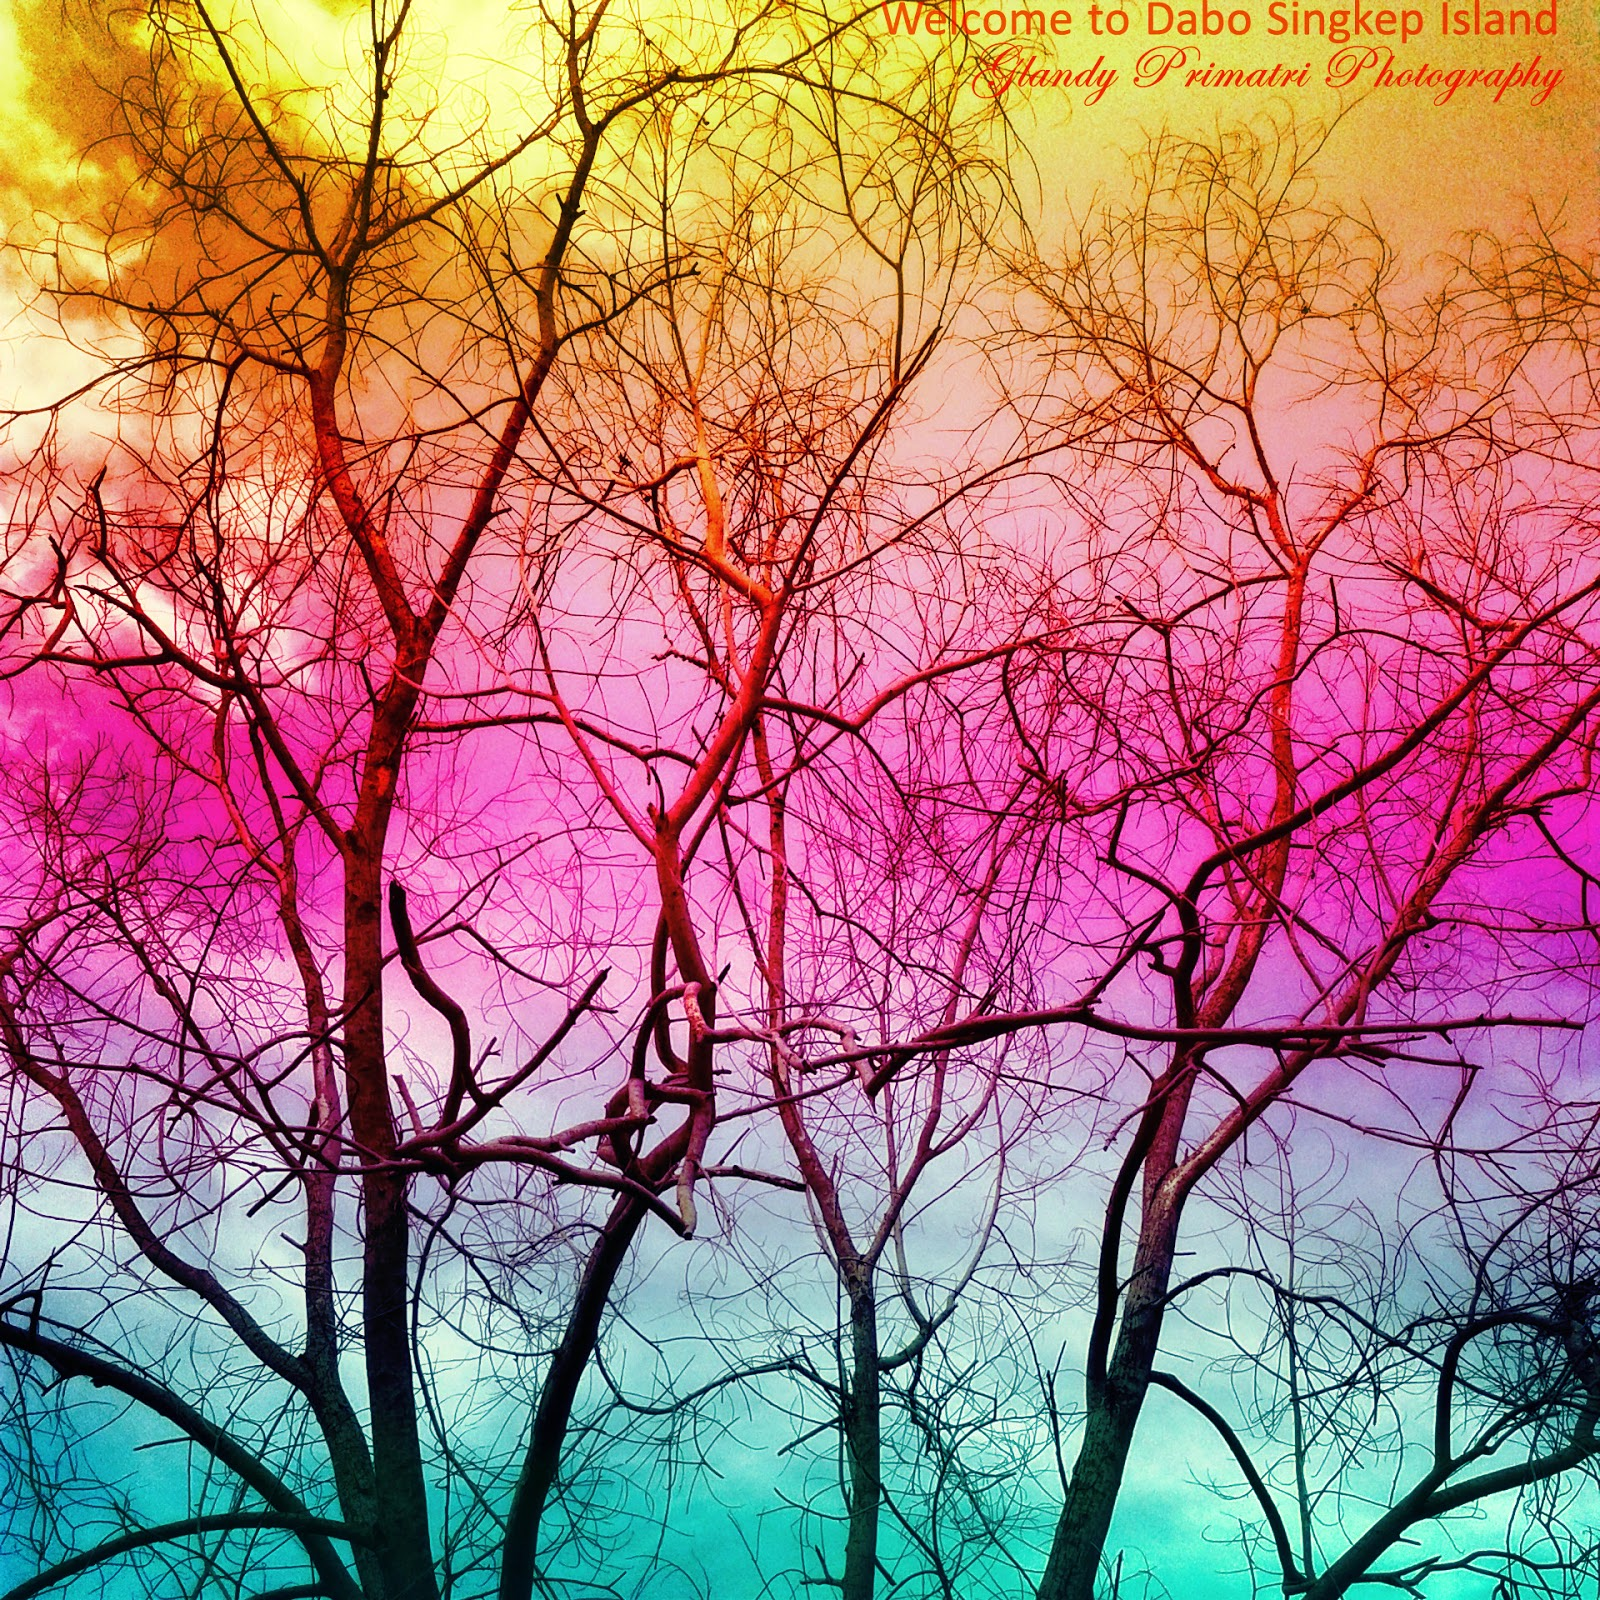 akasia, glandy, primatri, pohon, foto, alam, langit